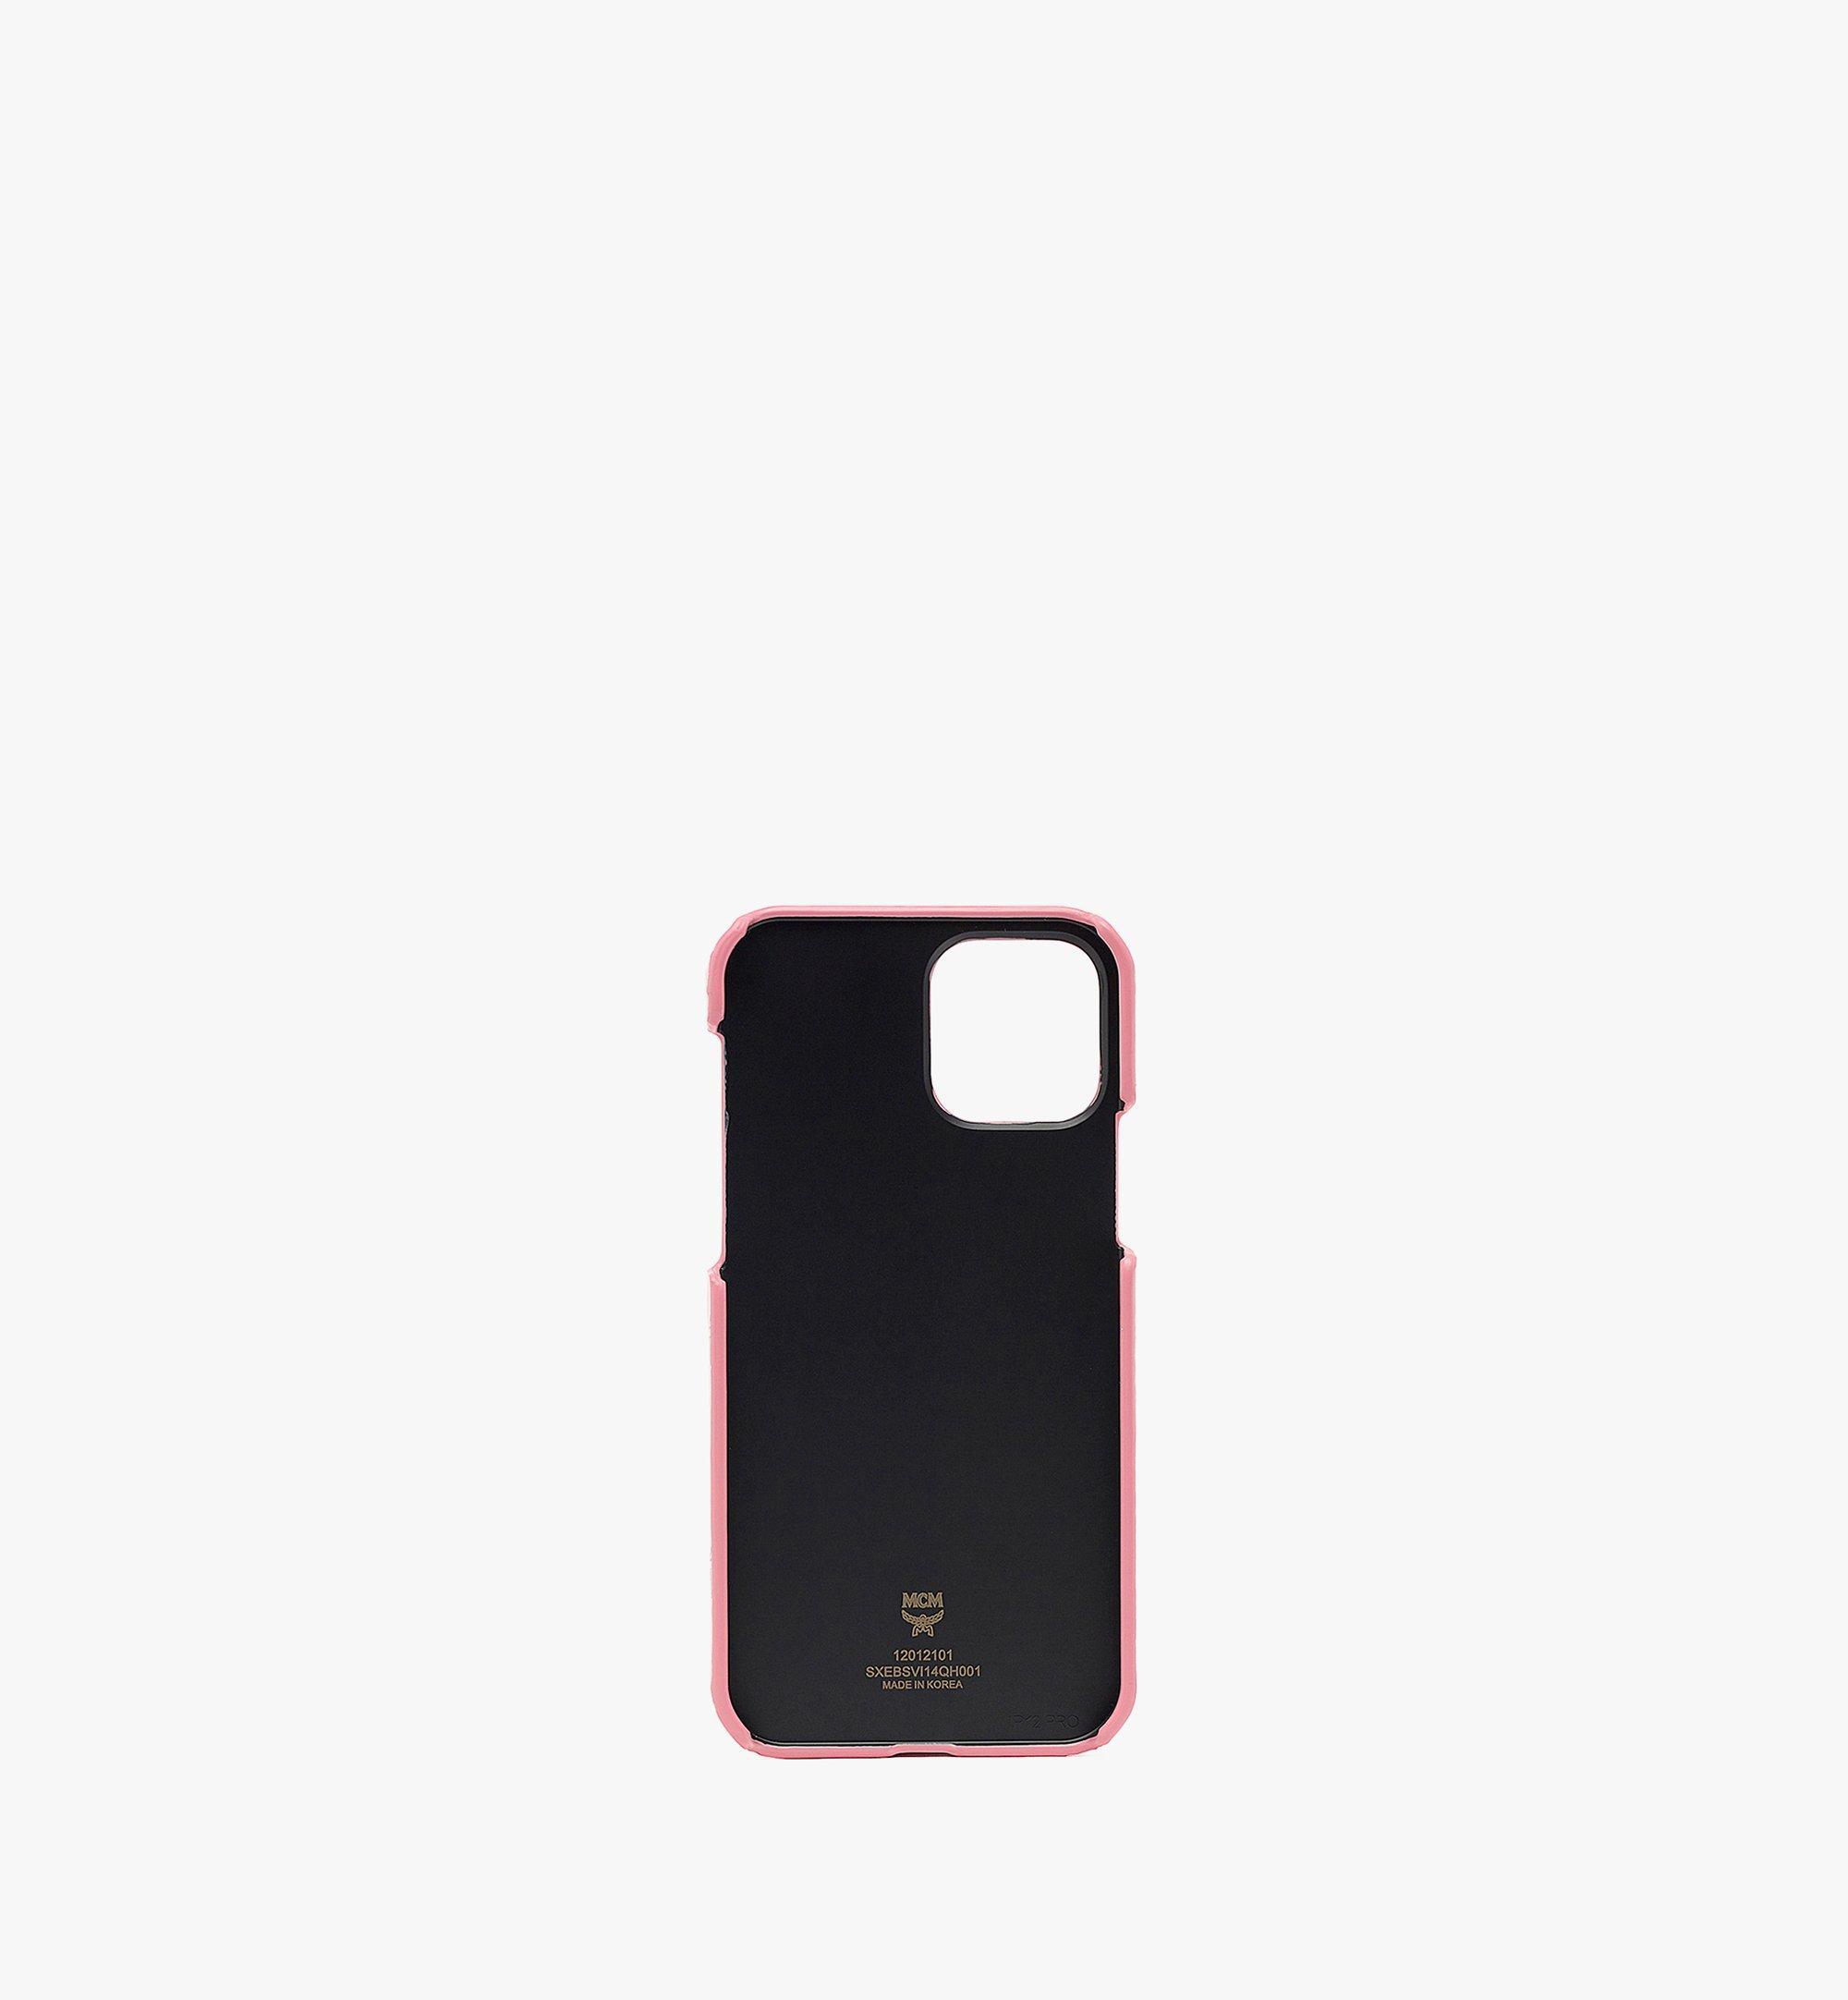 MCM iPhone 12/12 Pro Case in Visetos Original Pink MXEBSVI14QH001 Alternate View 1